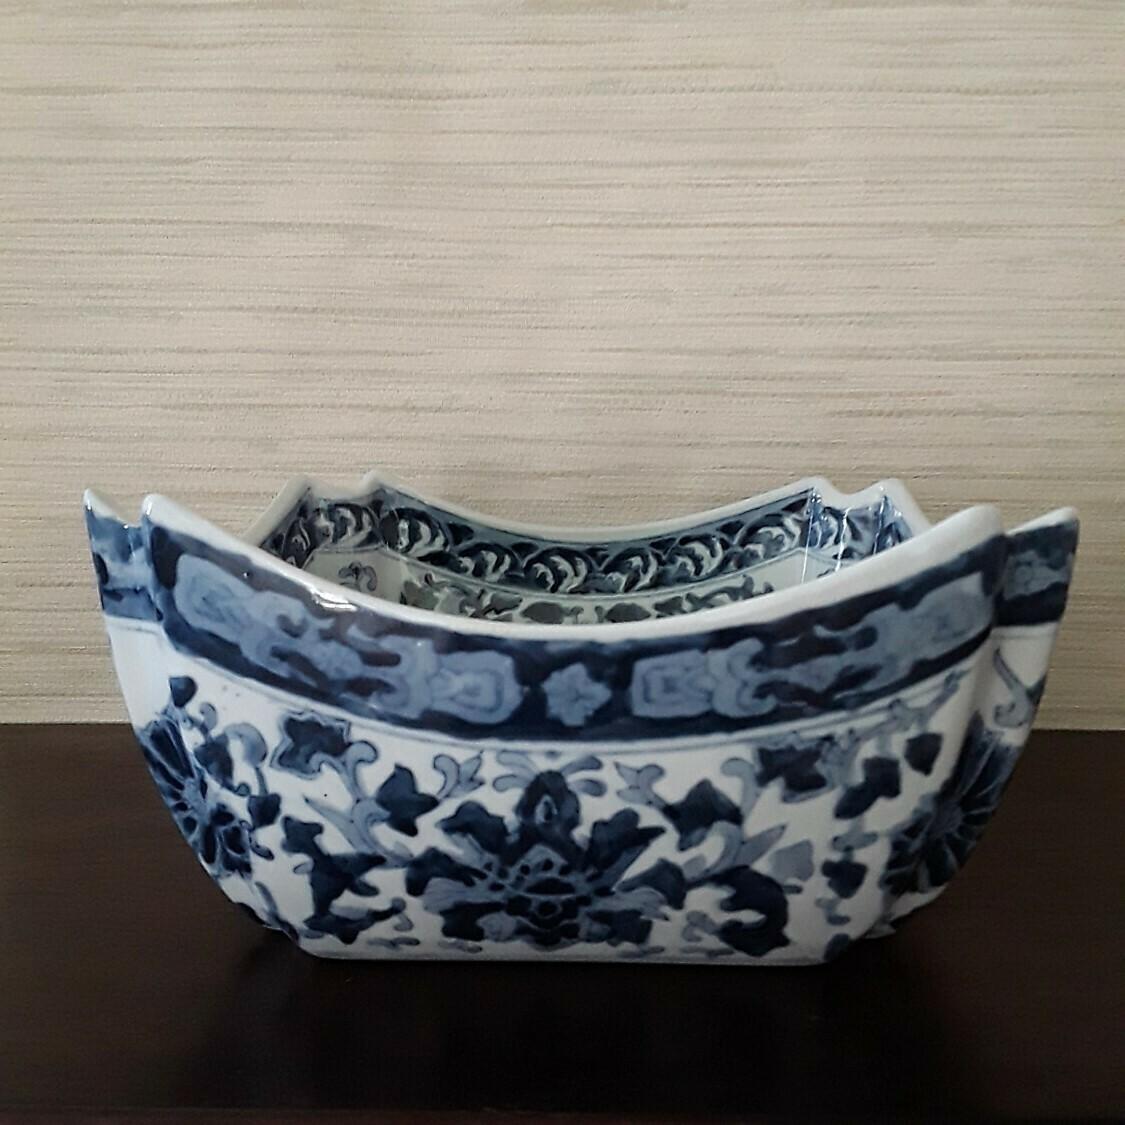 Vintage Blue and White Porcelain Square Cachepot